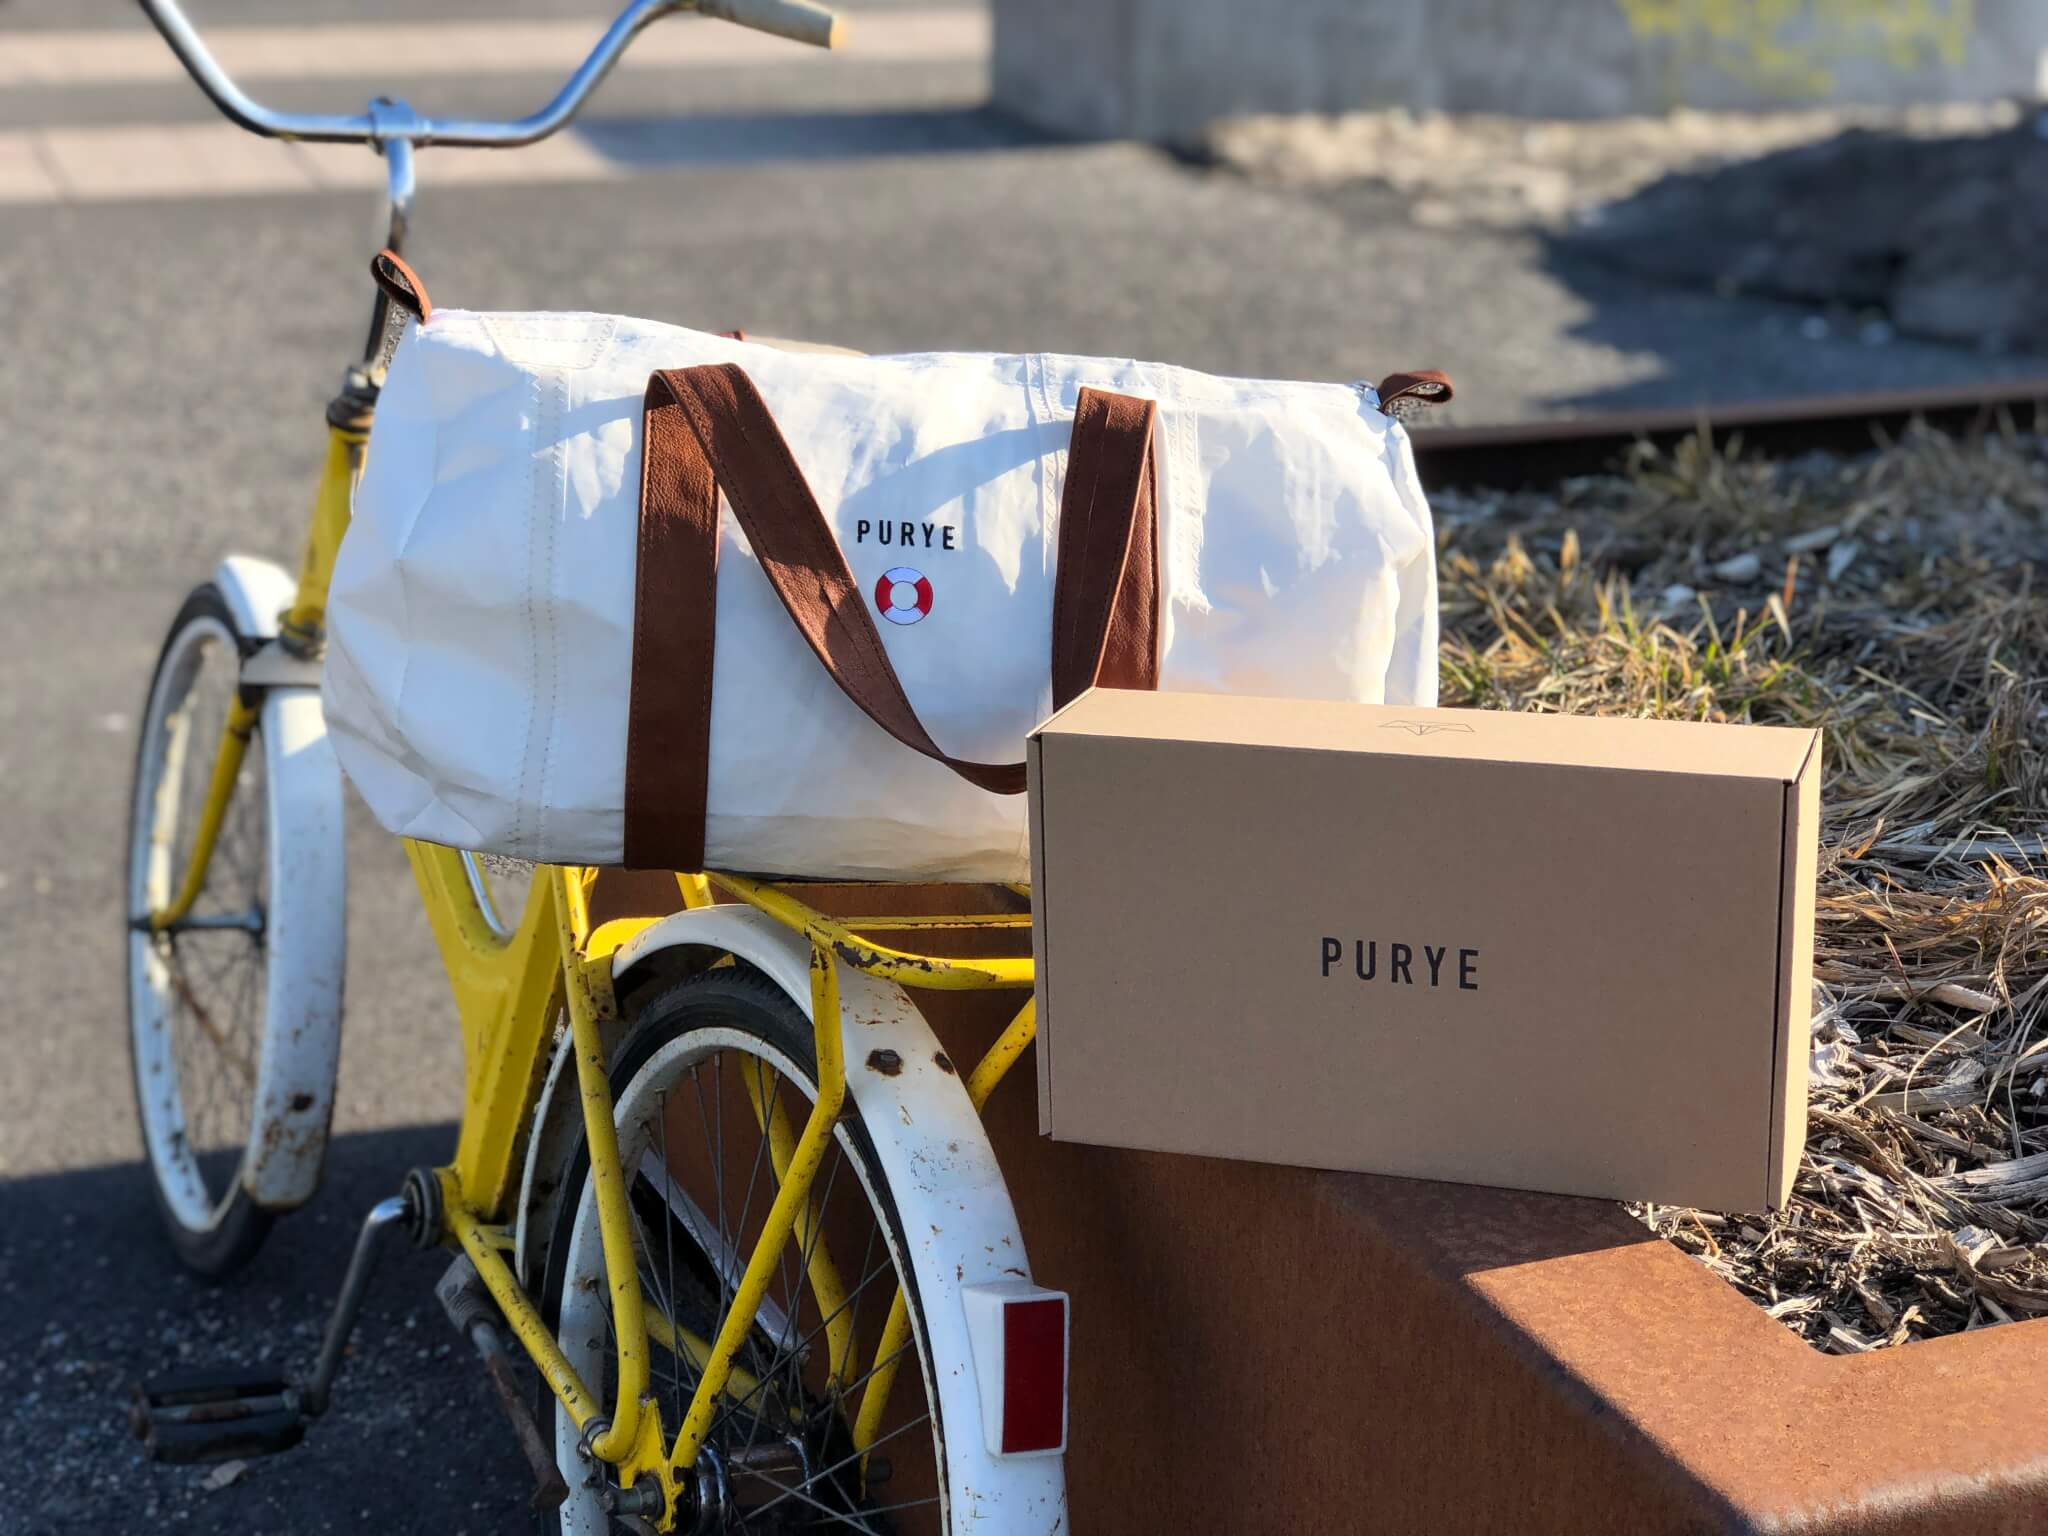 purye clothing krabice s potiskem packhelp